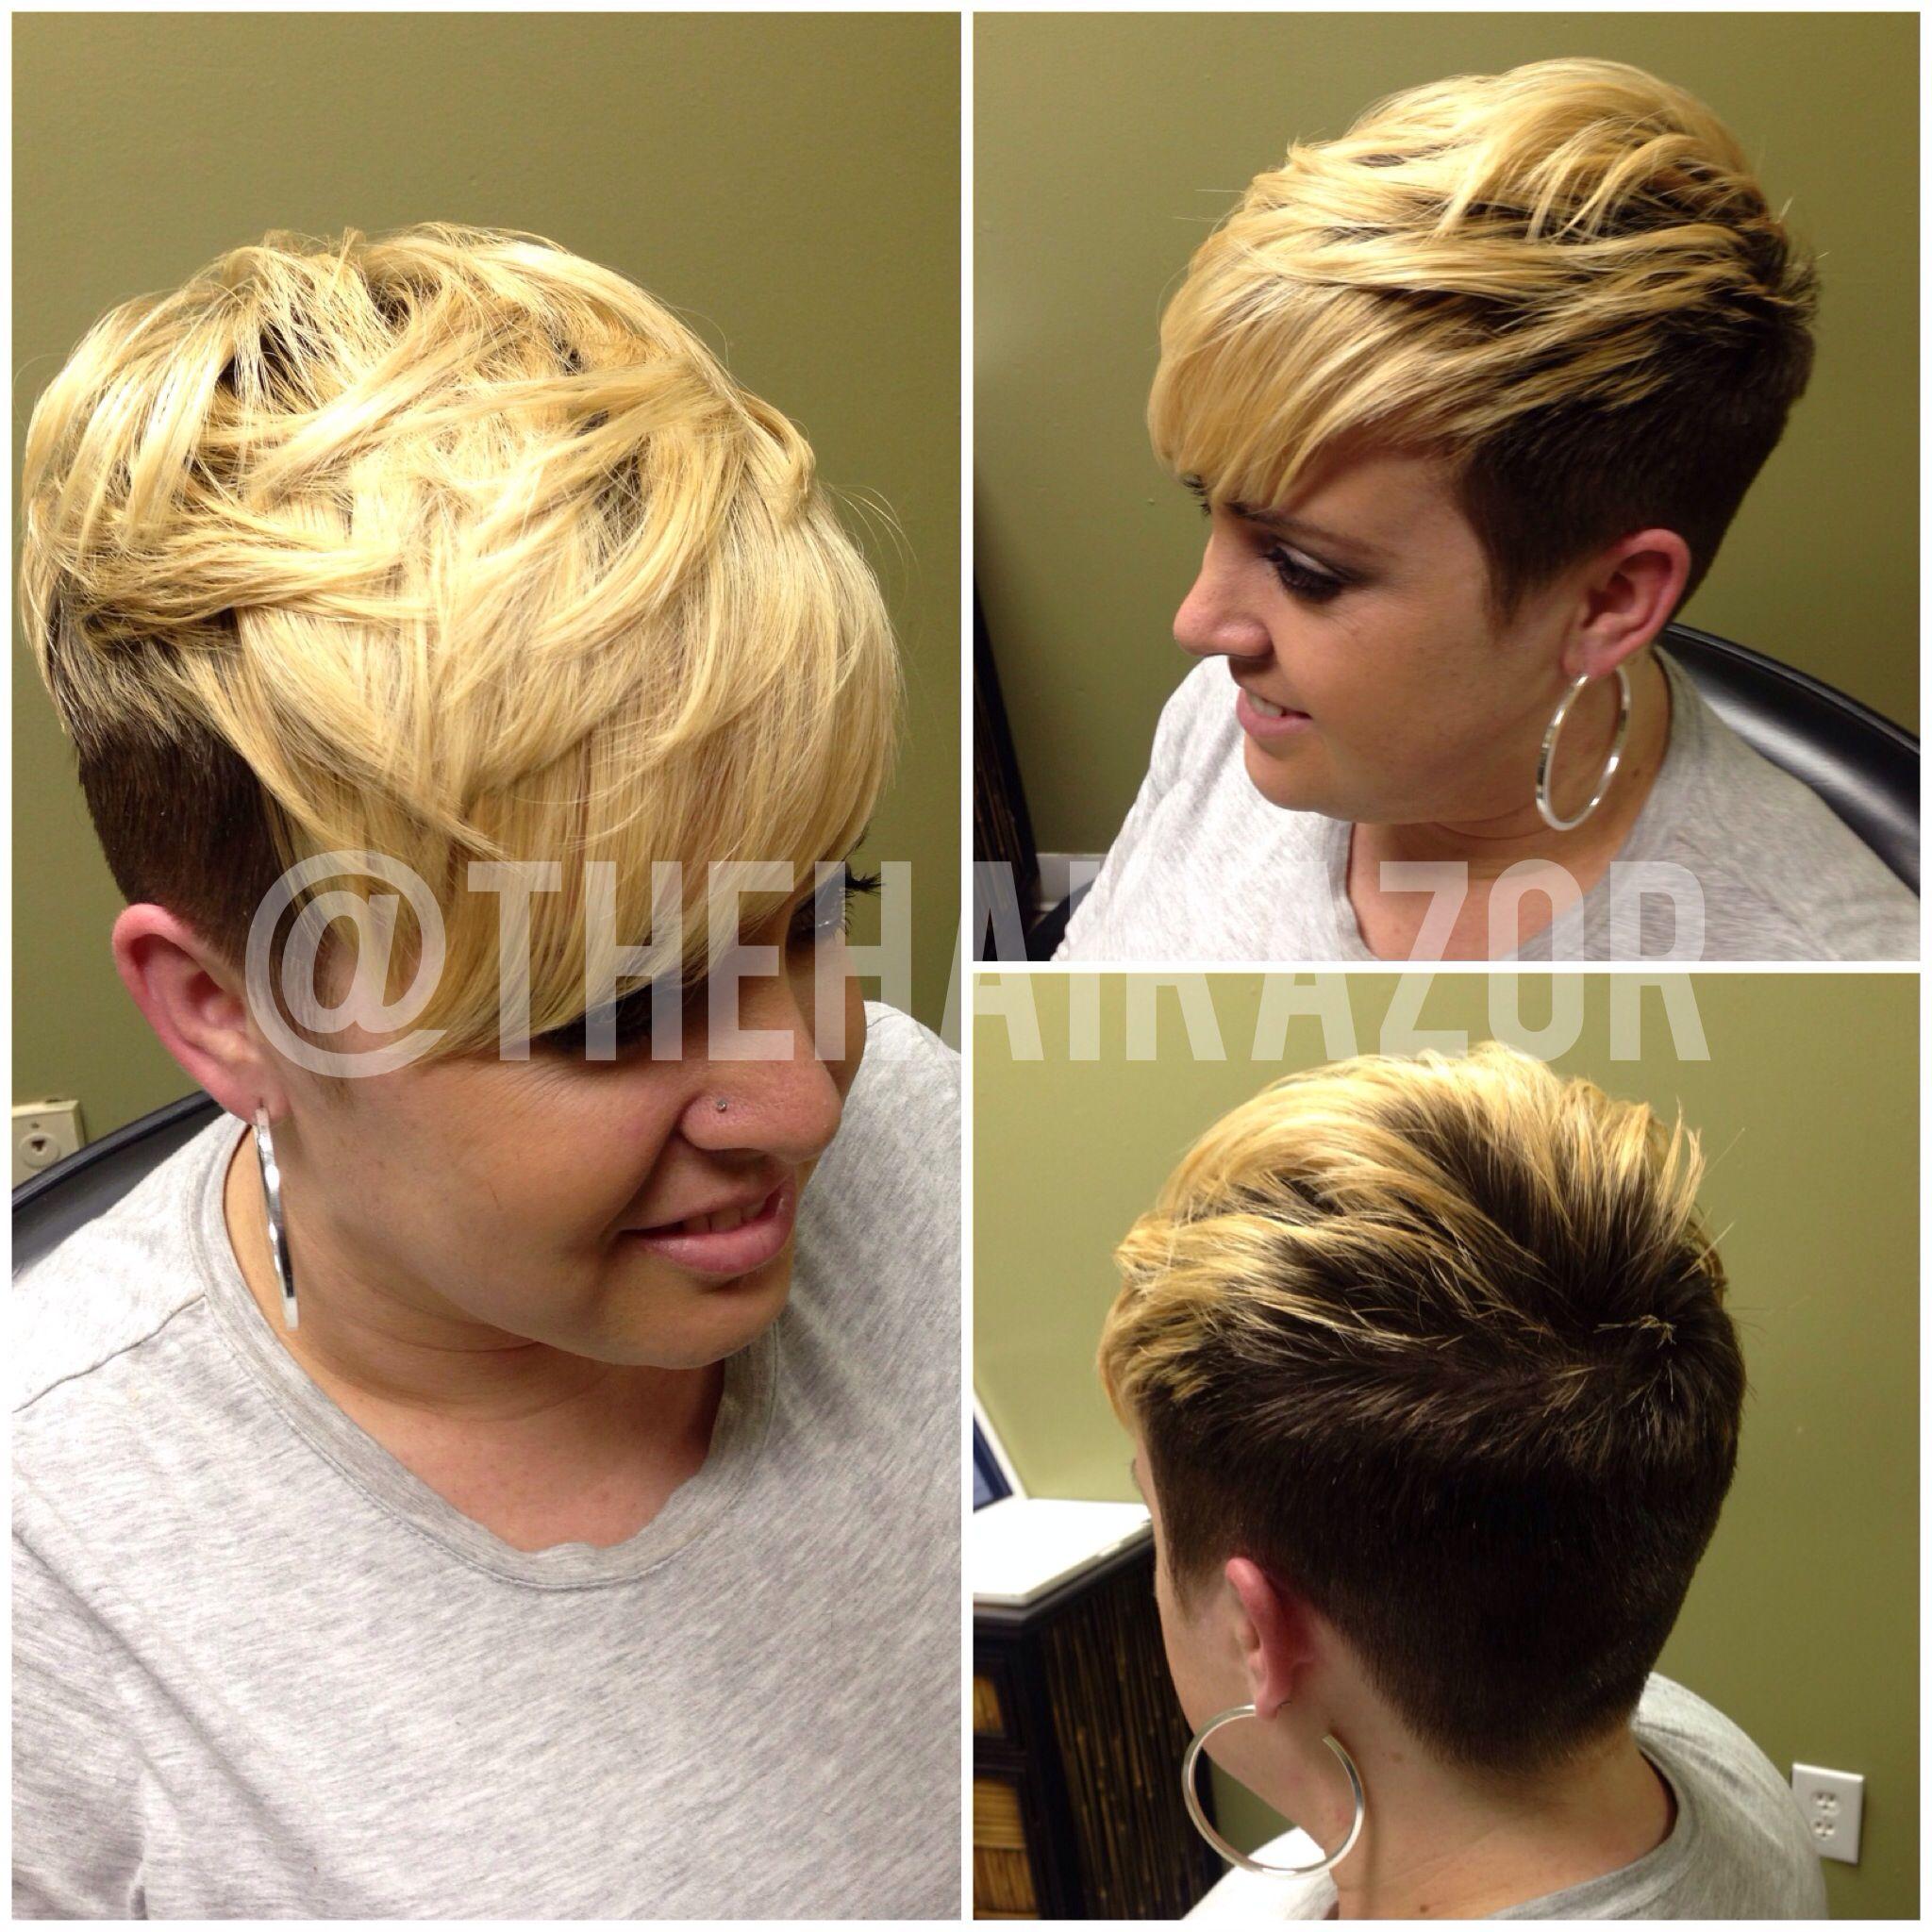 Christie Brimberry Haircut | www.galleryhip.com - The Hippest Pics